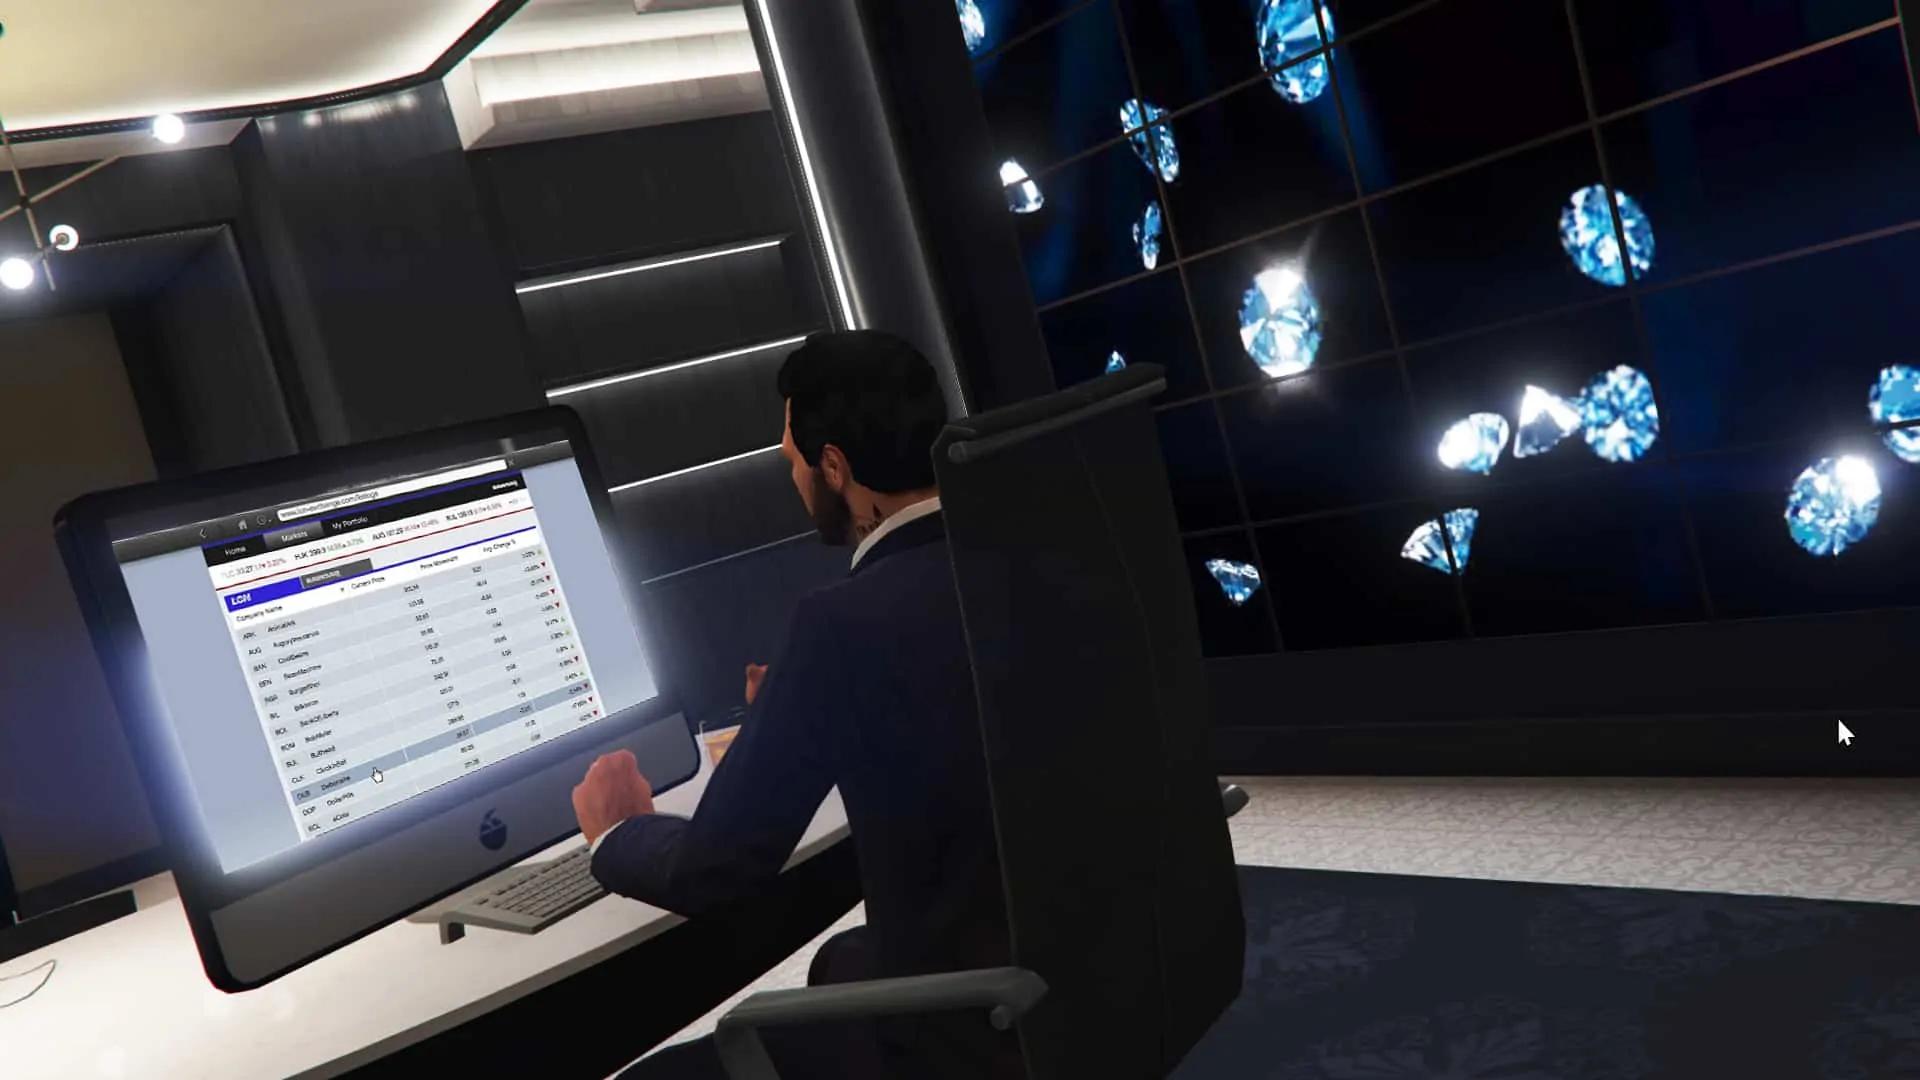 GTA 5 Stock Market Tips: Make The Most Money Possible - GTA BOOM